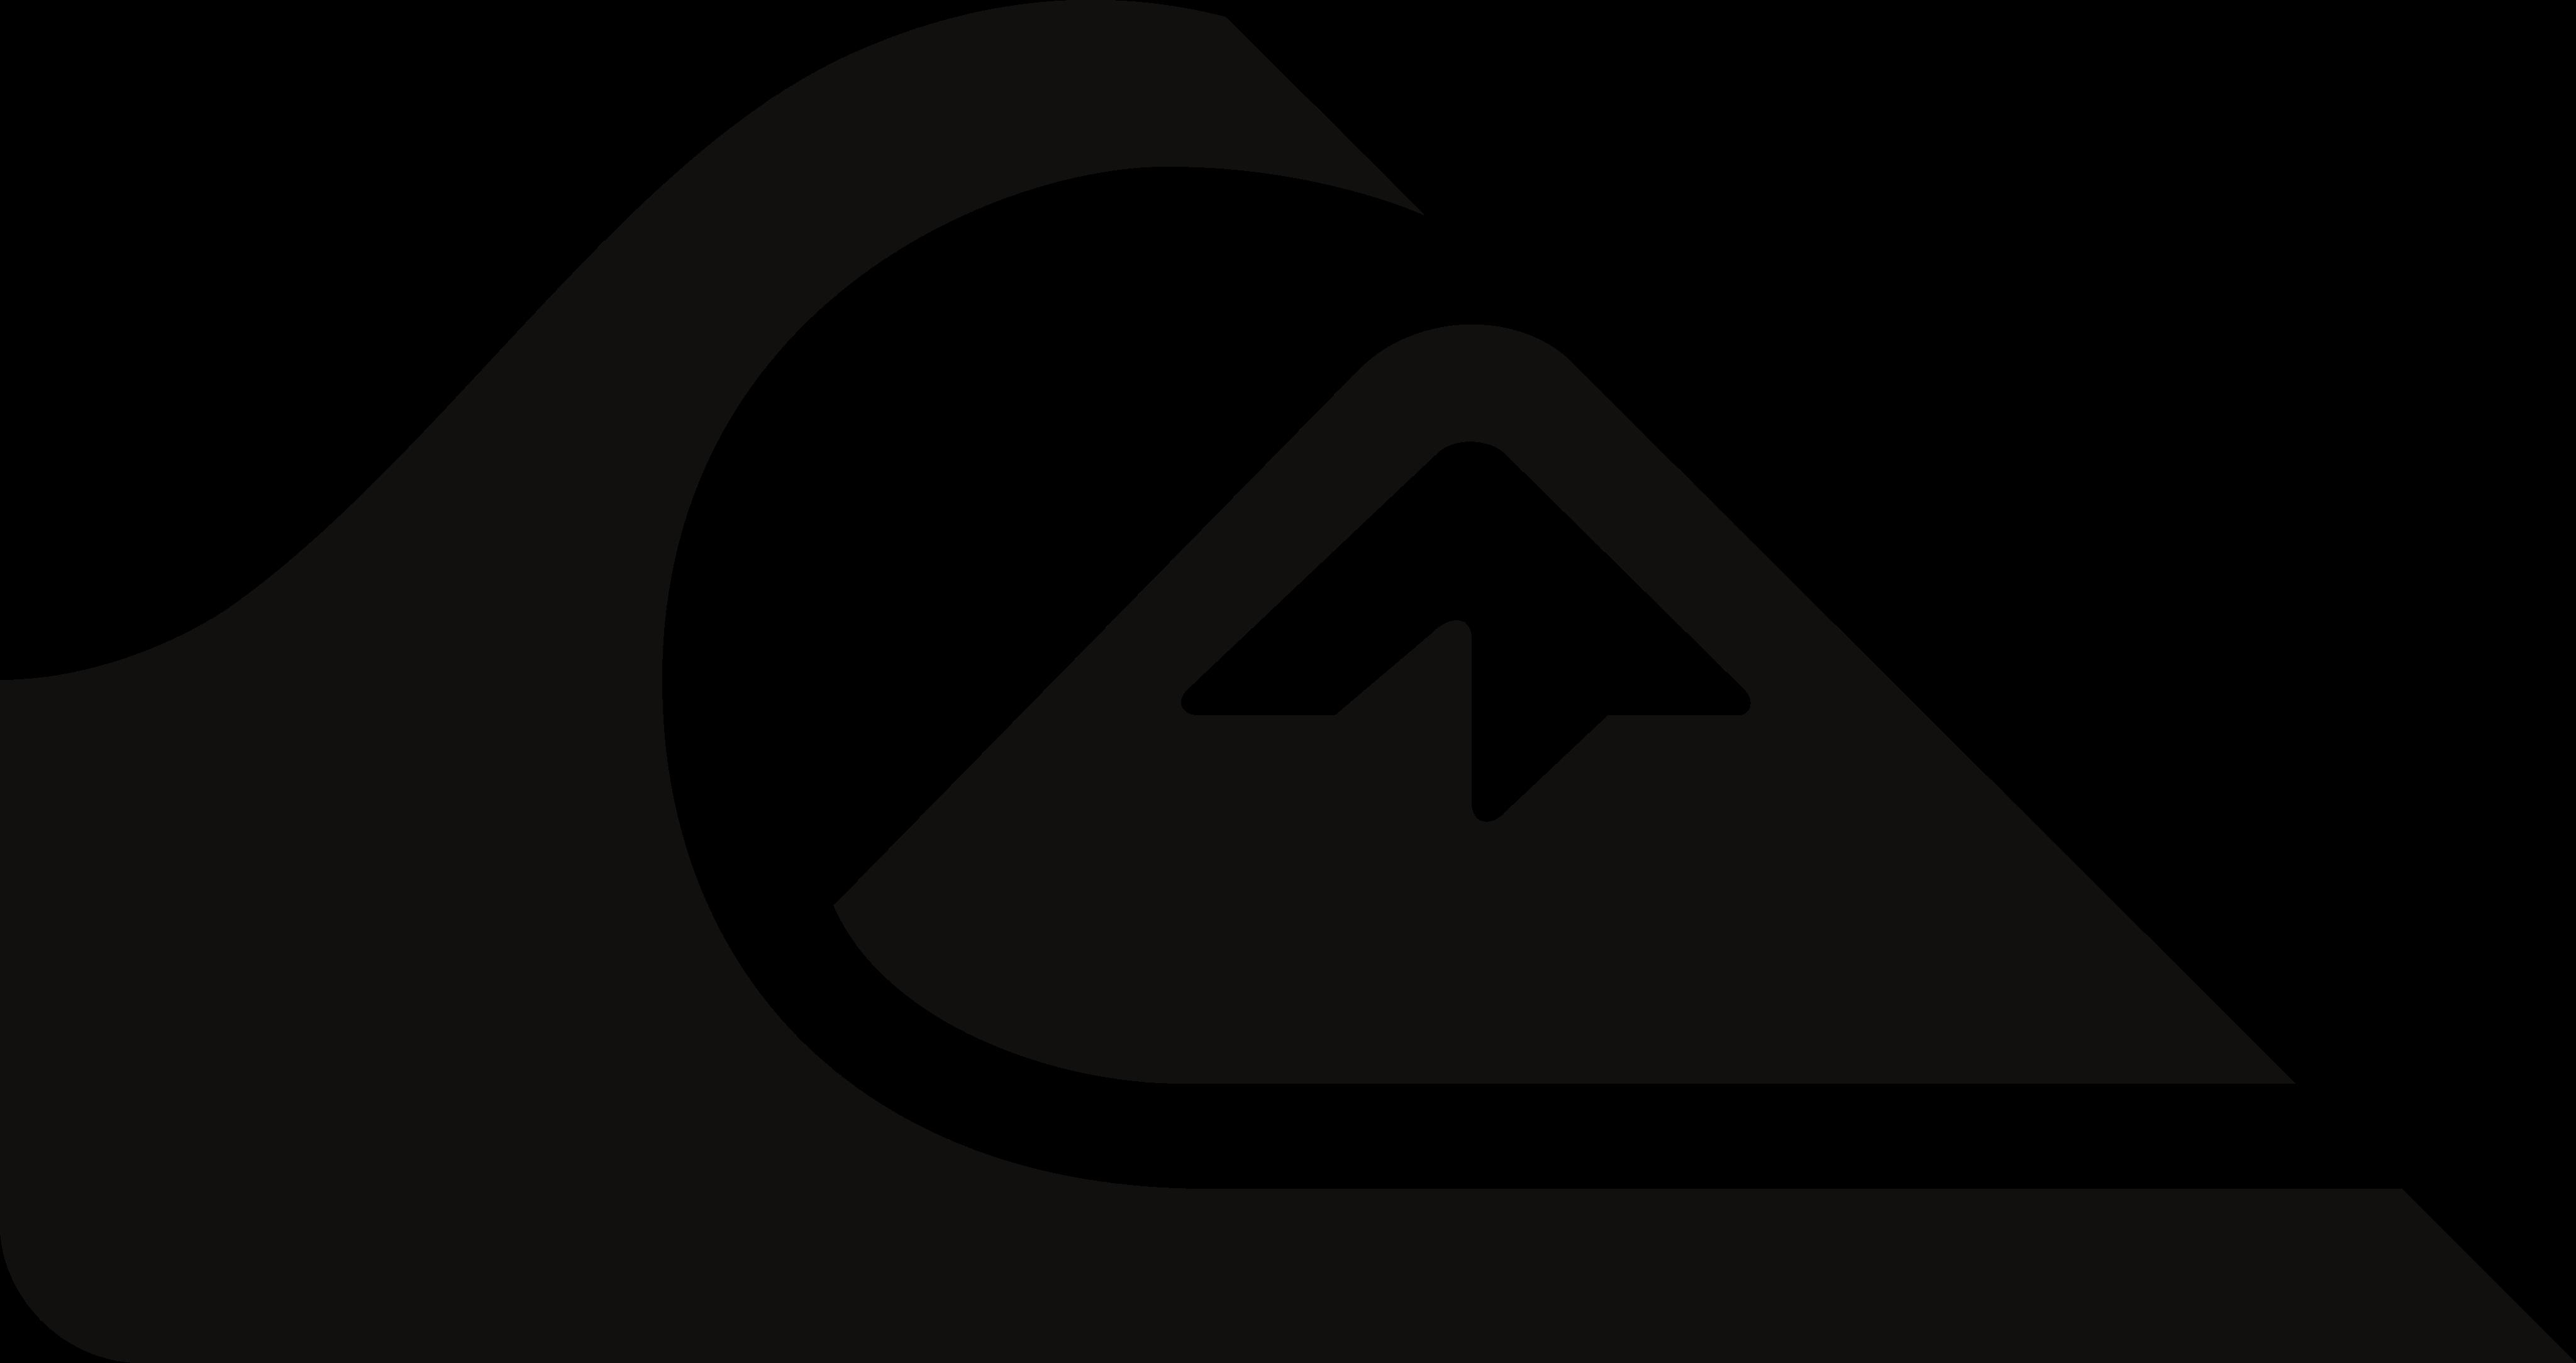 quiksilver logo 2 - Quiksilver Logo